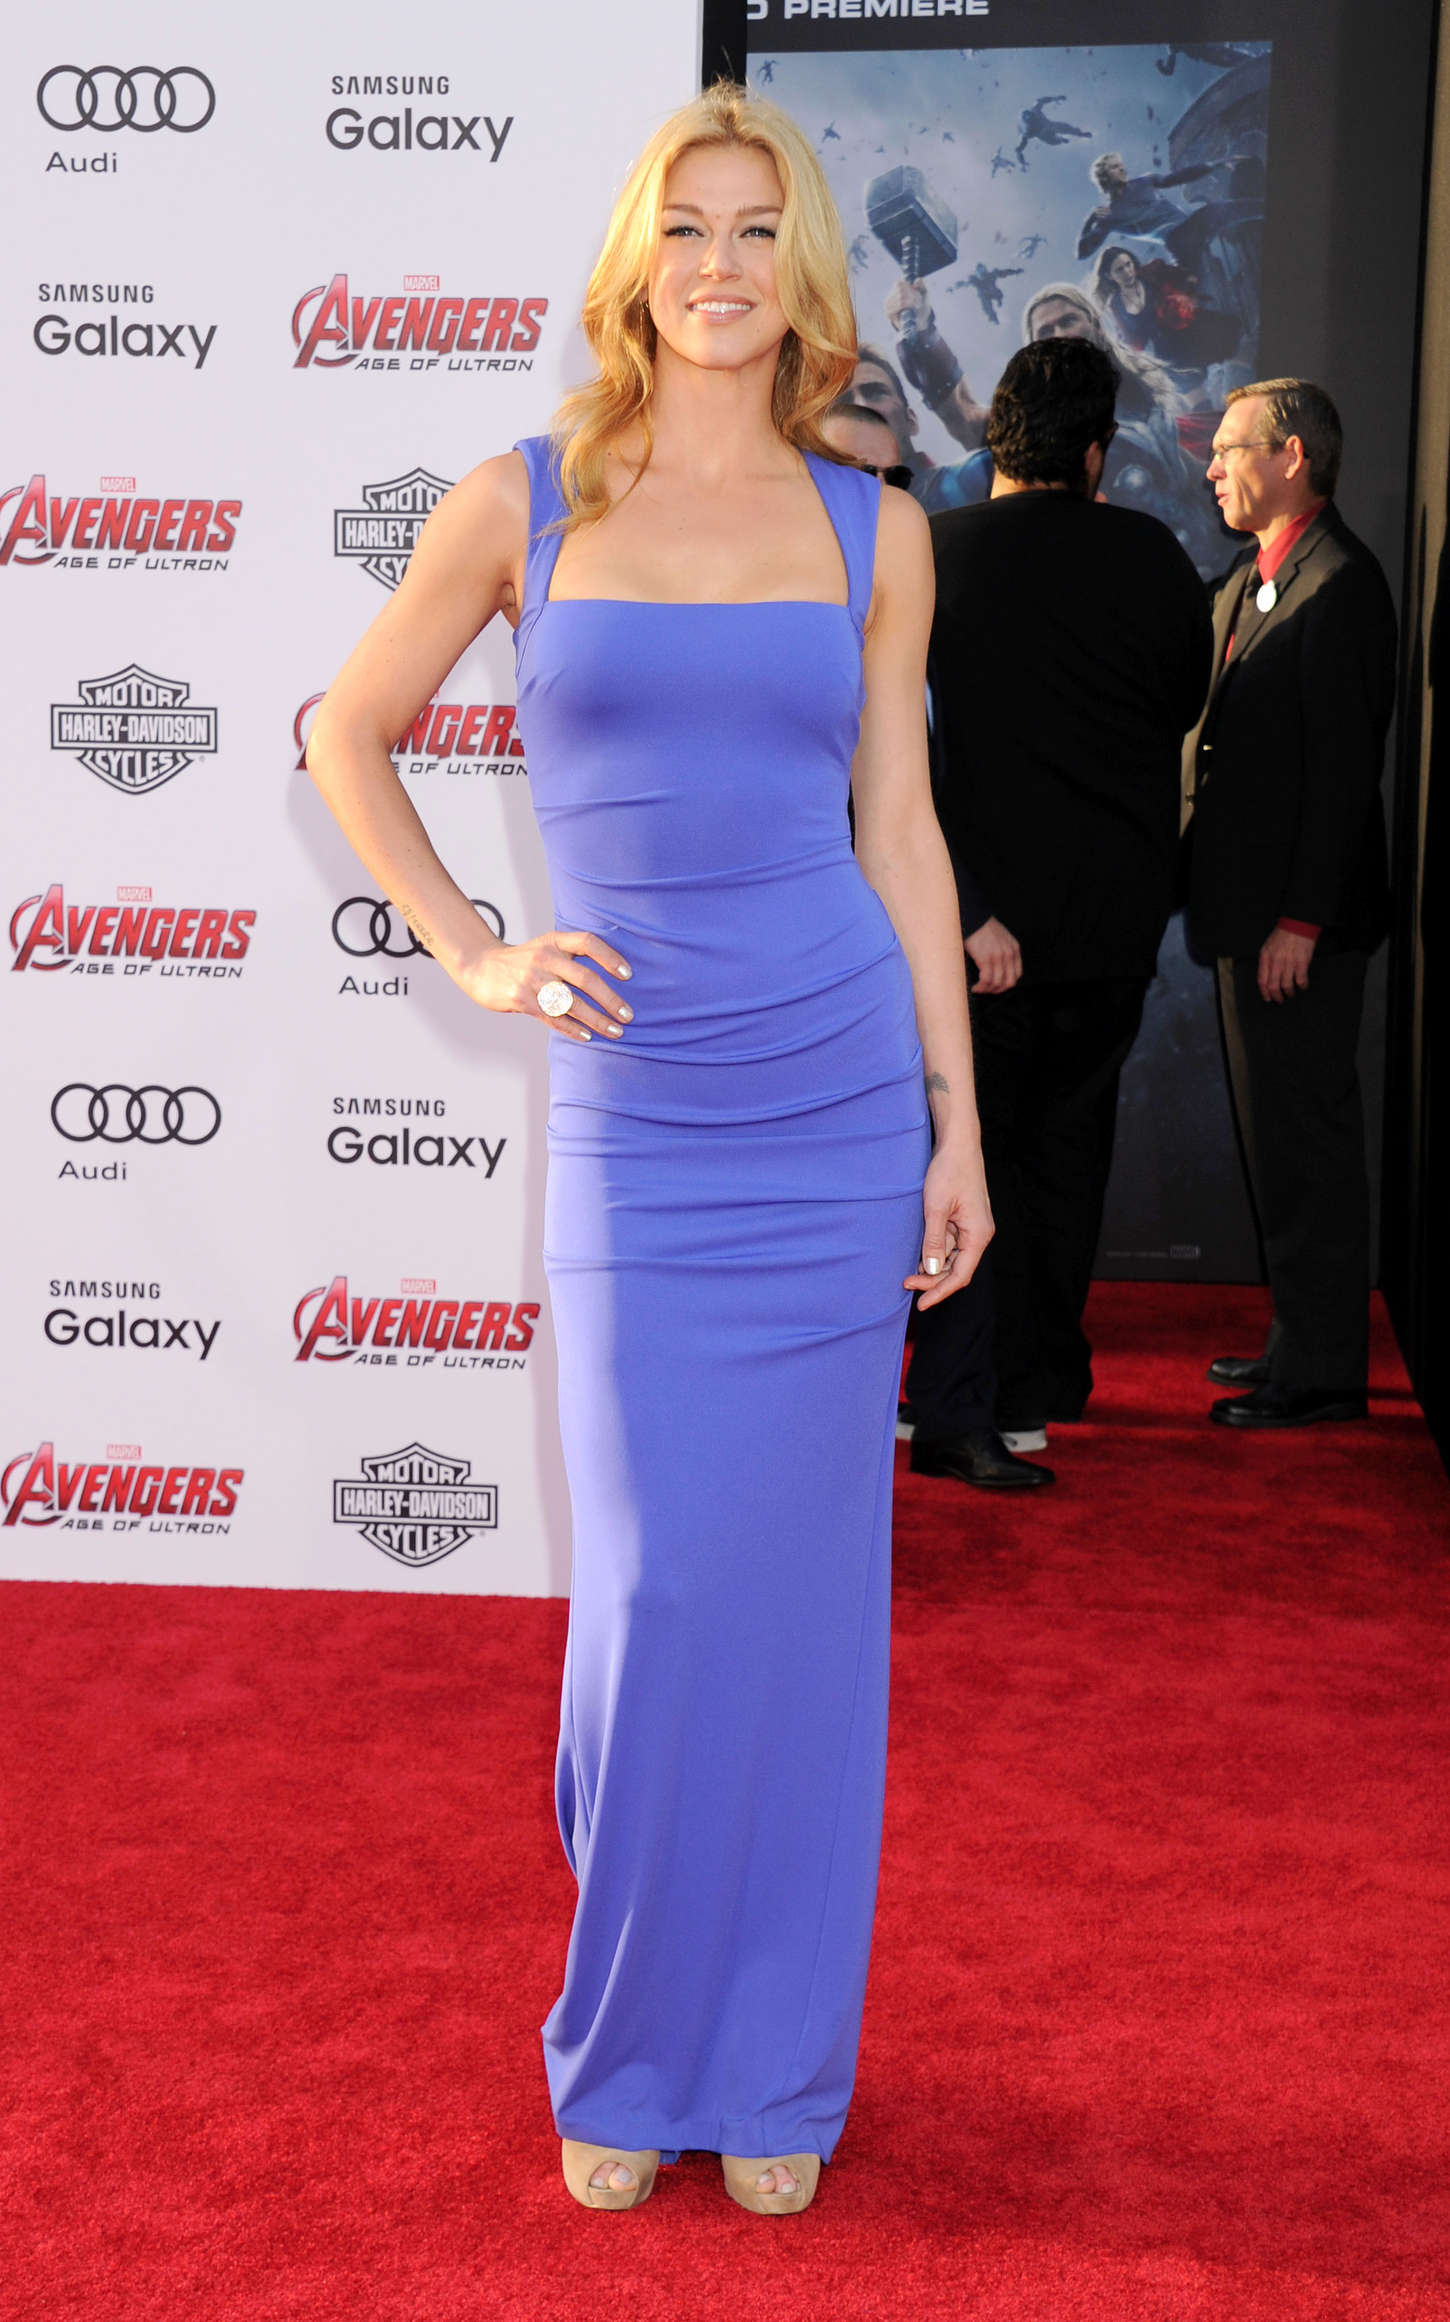 Adrianne Palicki avengers